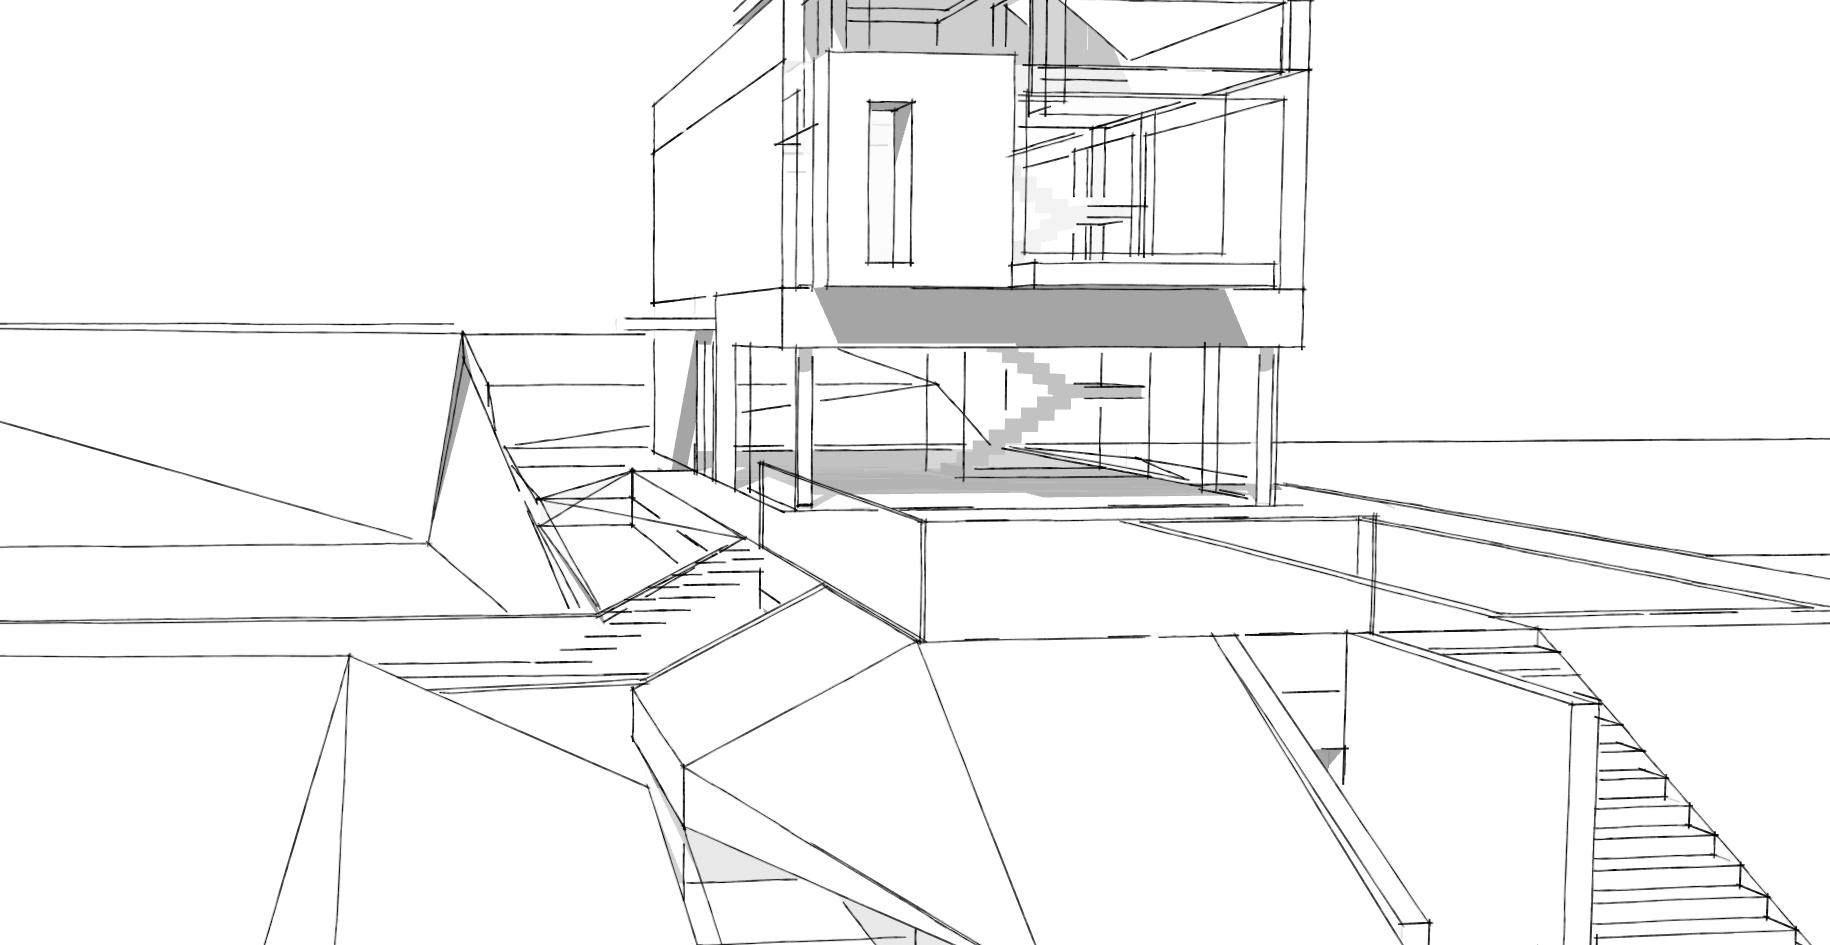 02_entwurf_architektur_rolandgasperl.at